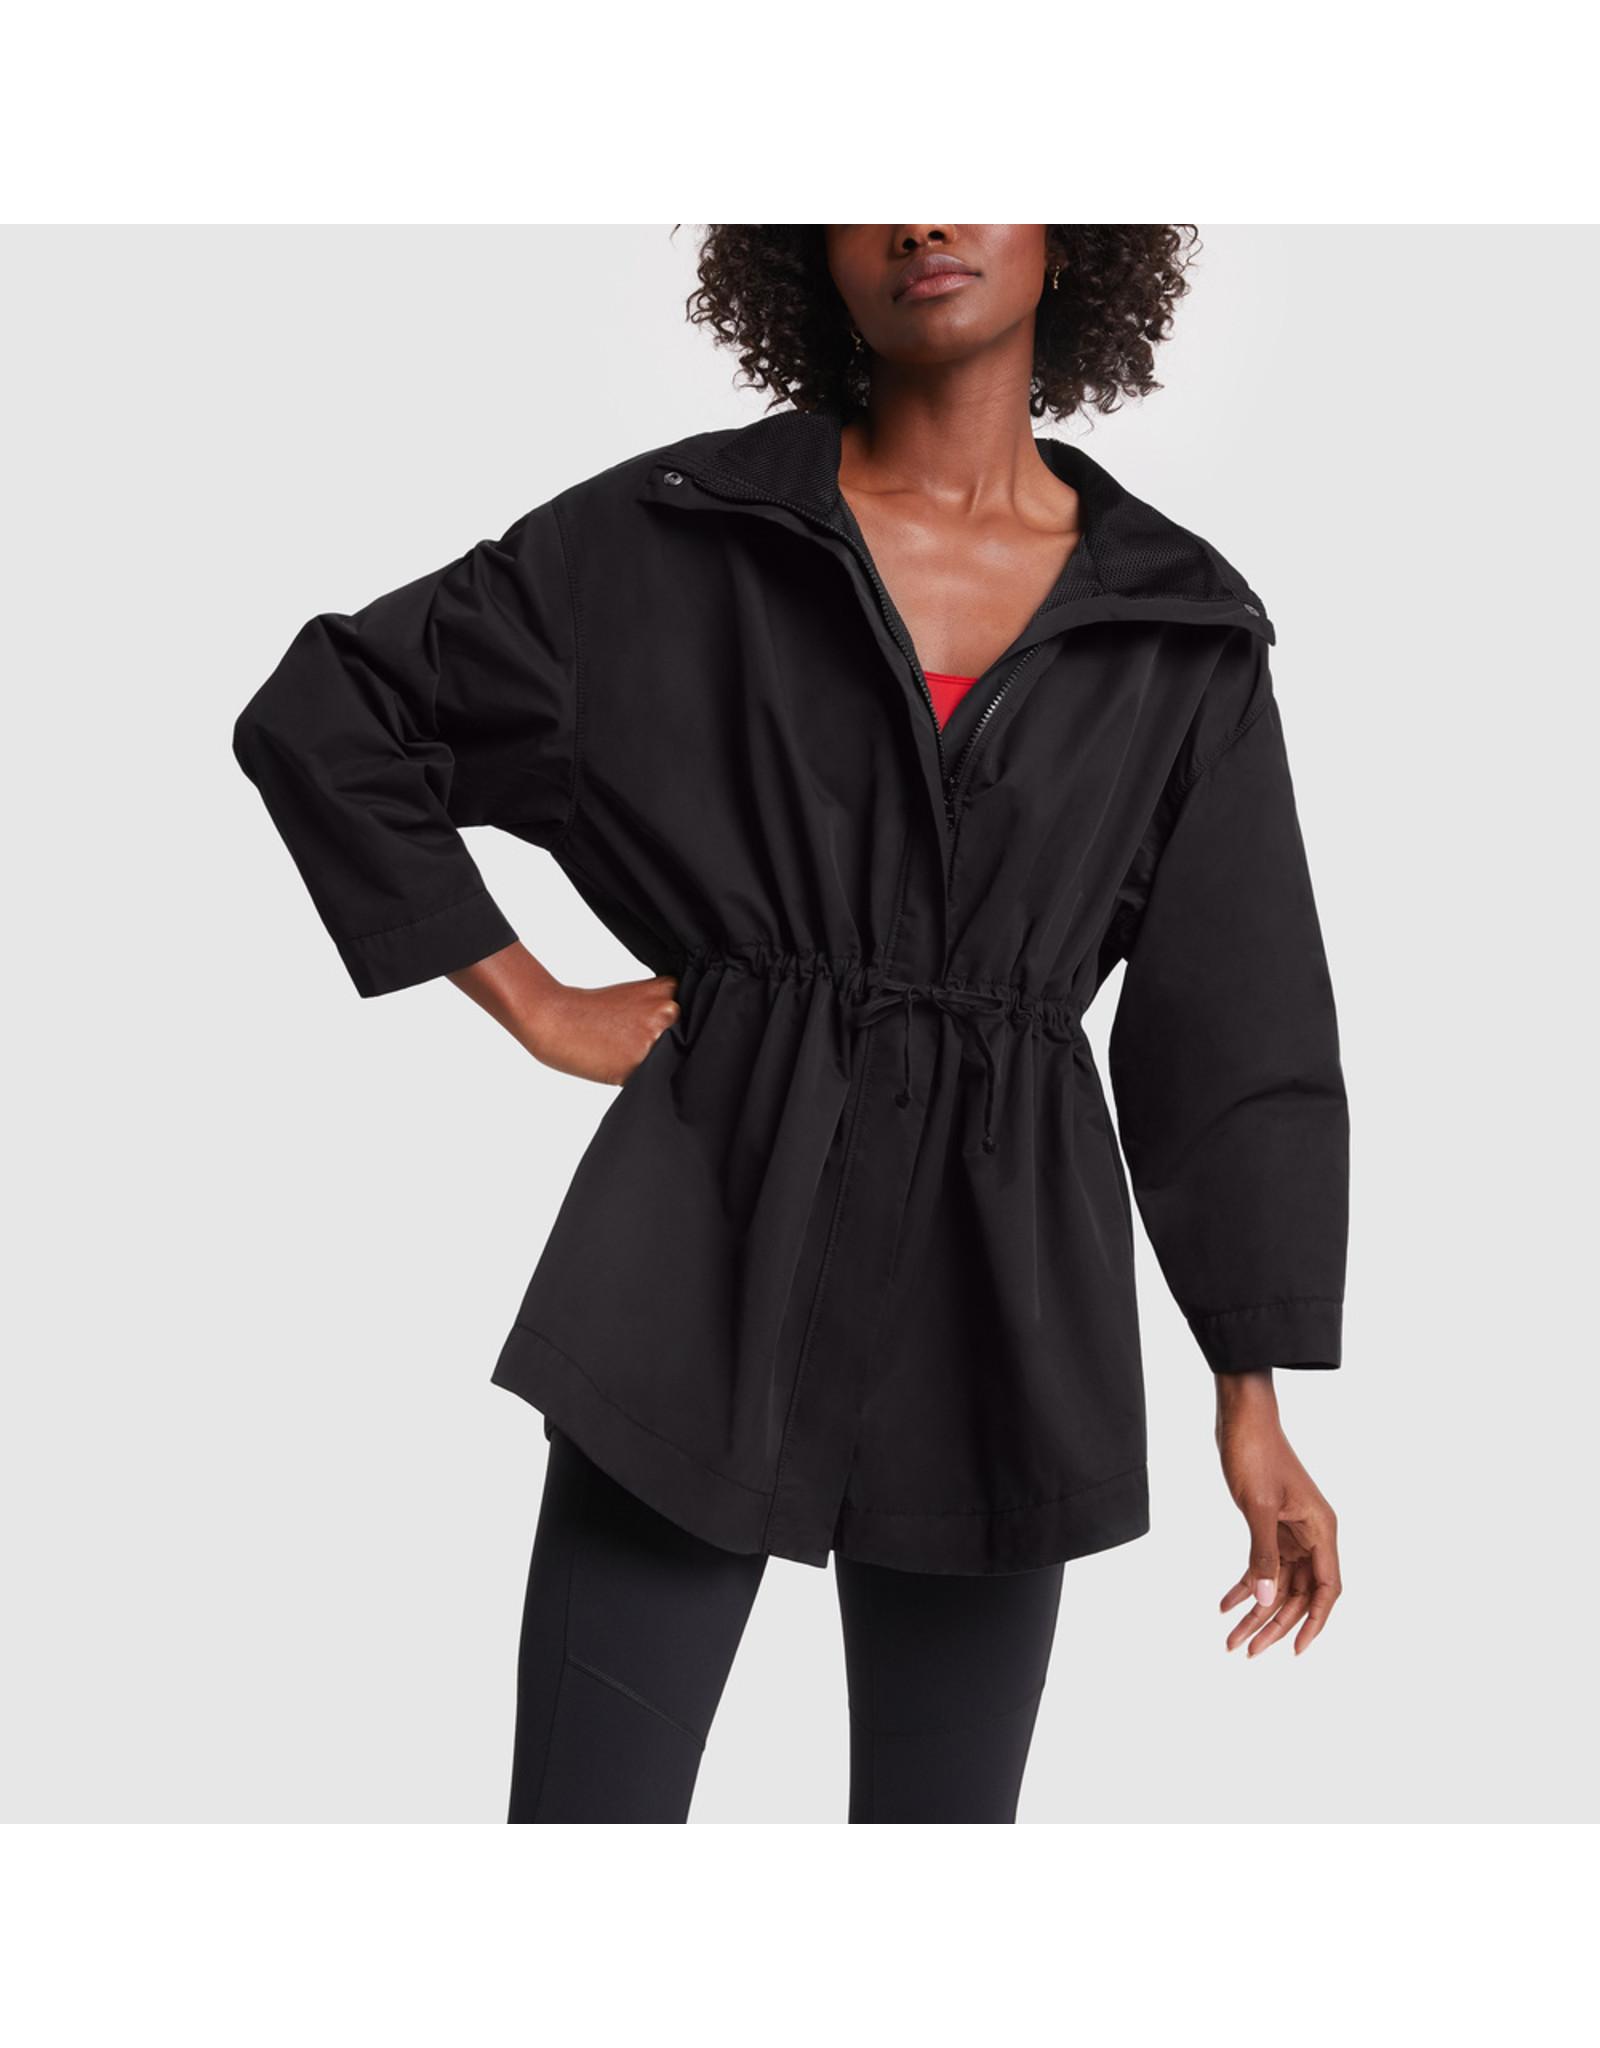 G. Sport x Proenza Schouler G. Sport x Proenza Schouler Jacket (Color: Black, Size: L)